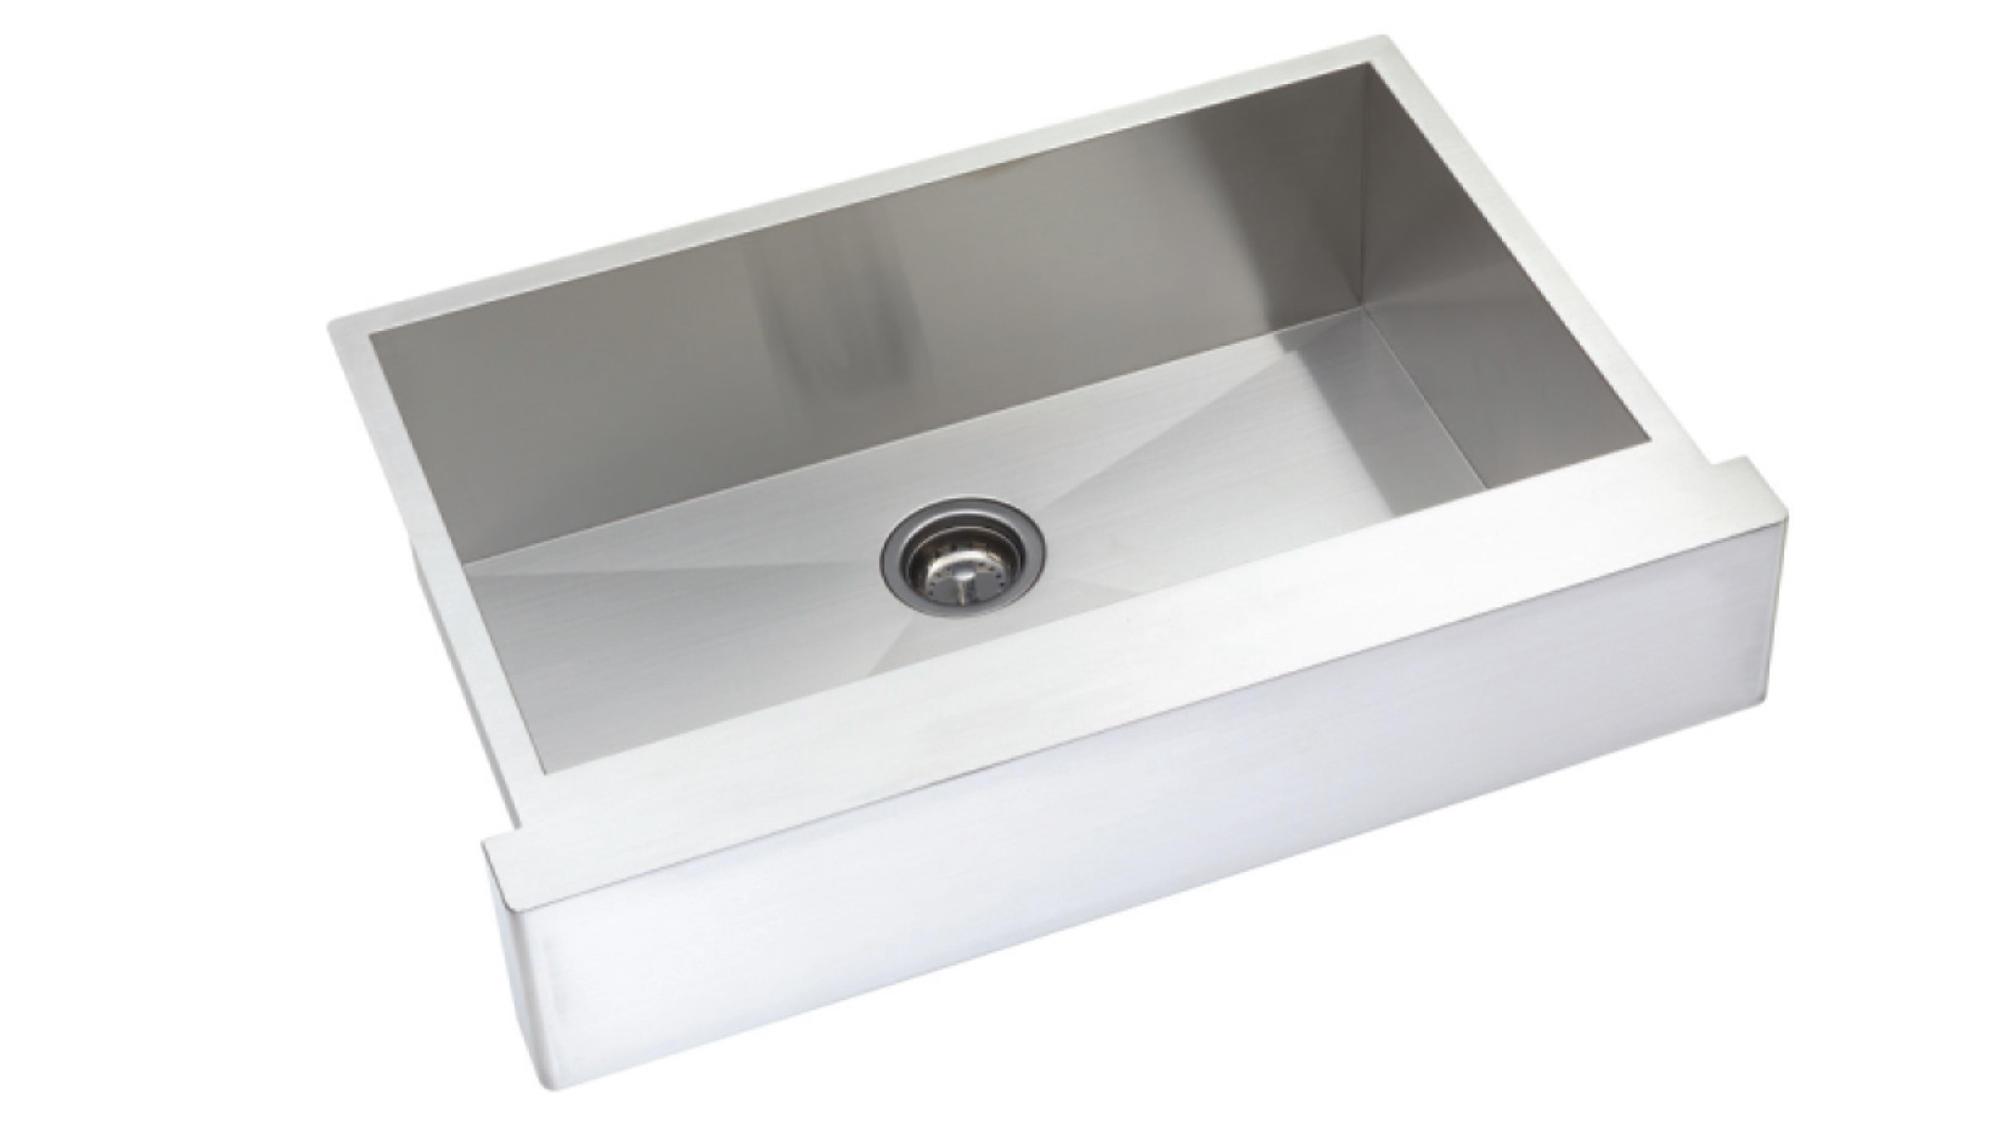 4a0e8aab4 Plumbing fixture-maker Kohler sues suburban rival over kitchen sink design